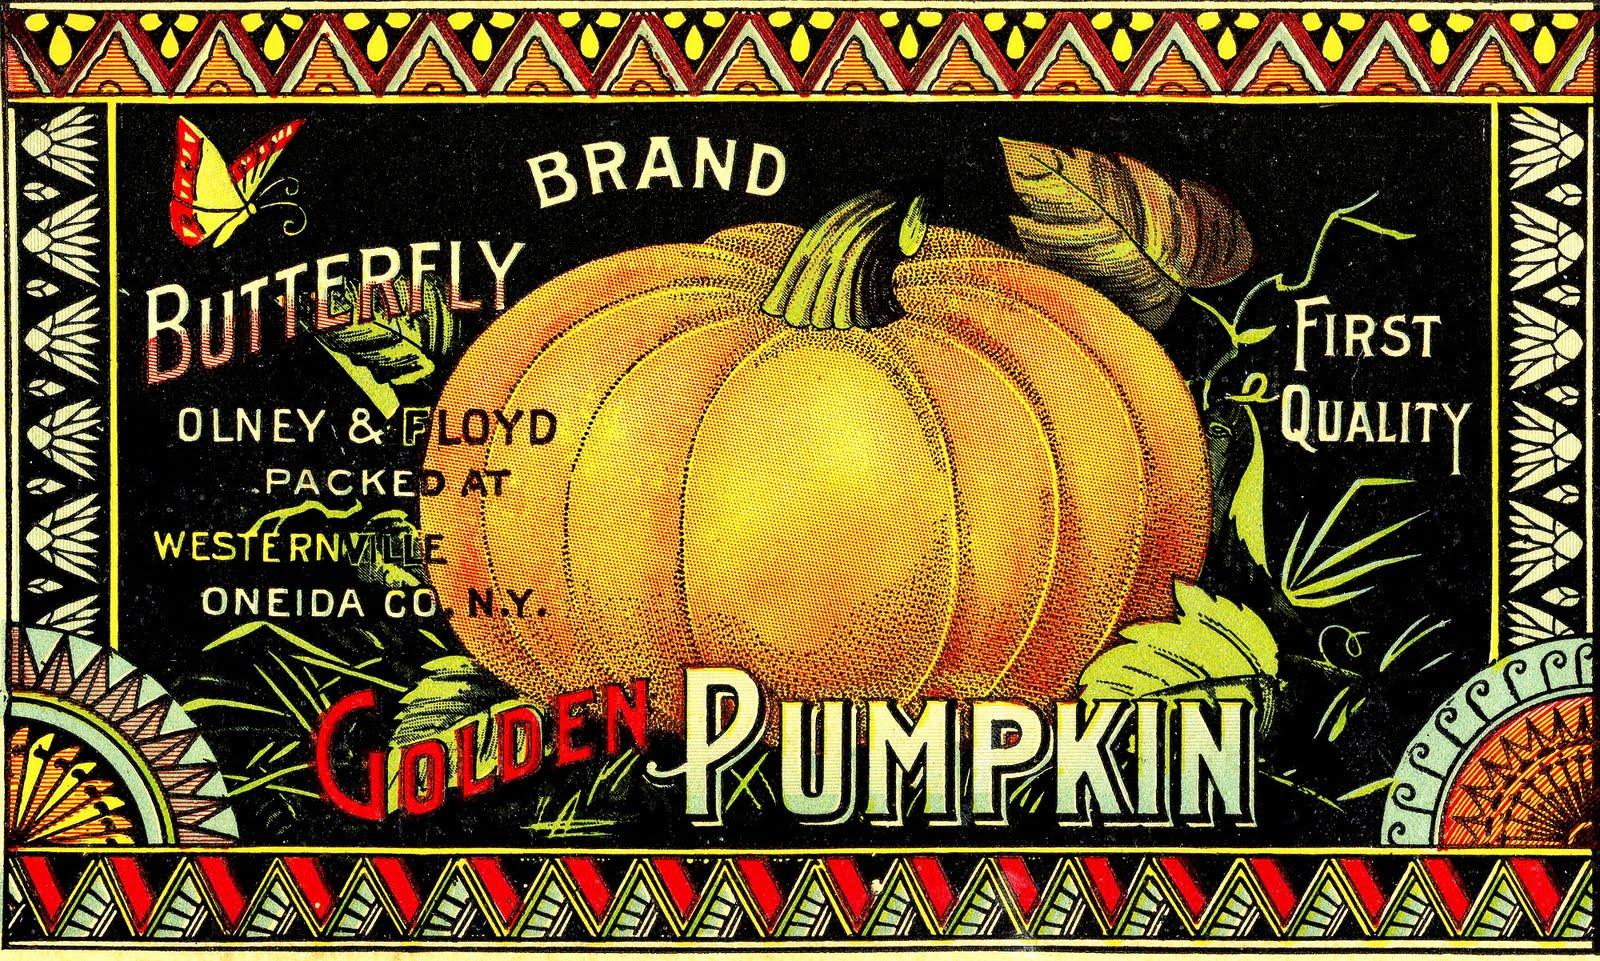 Vintage Halloween Wallpapers (50 Wallpapers) - Adorable ...